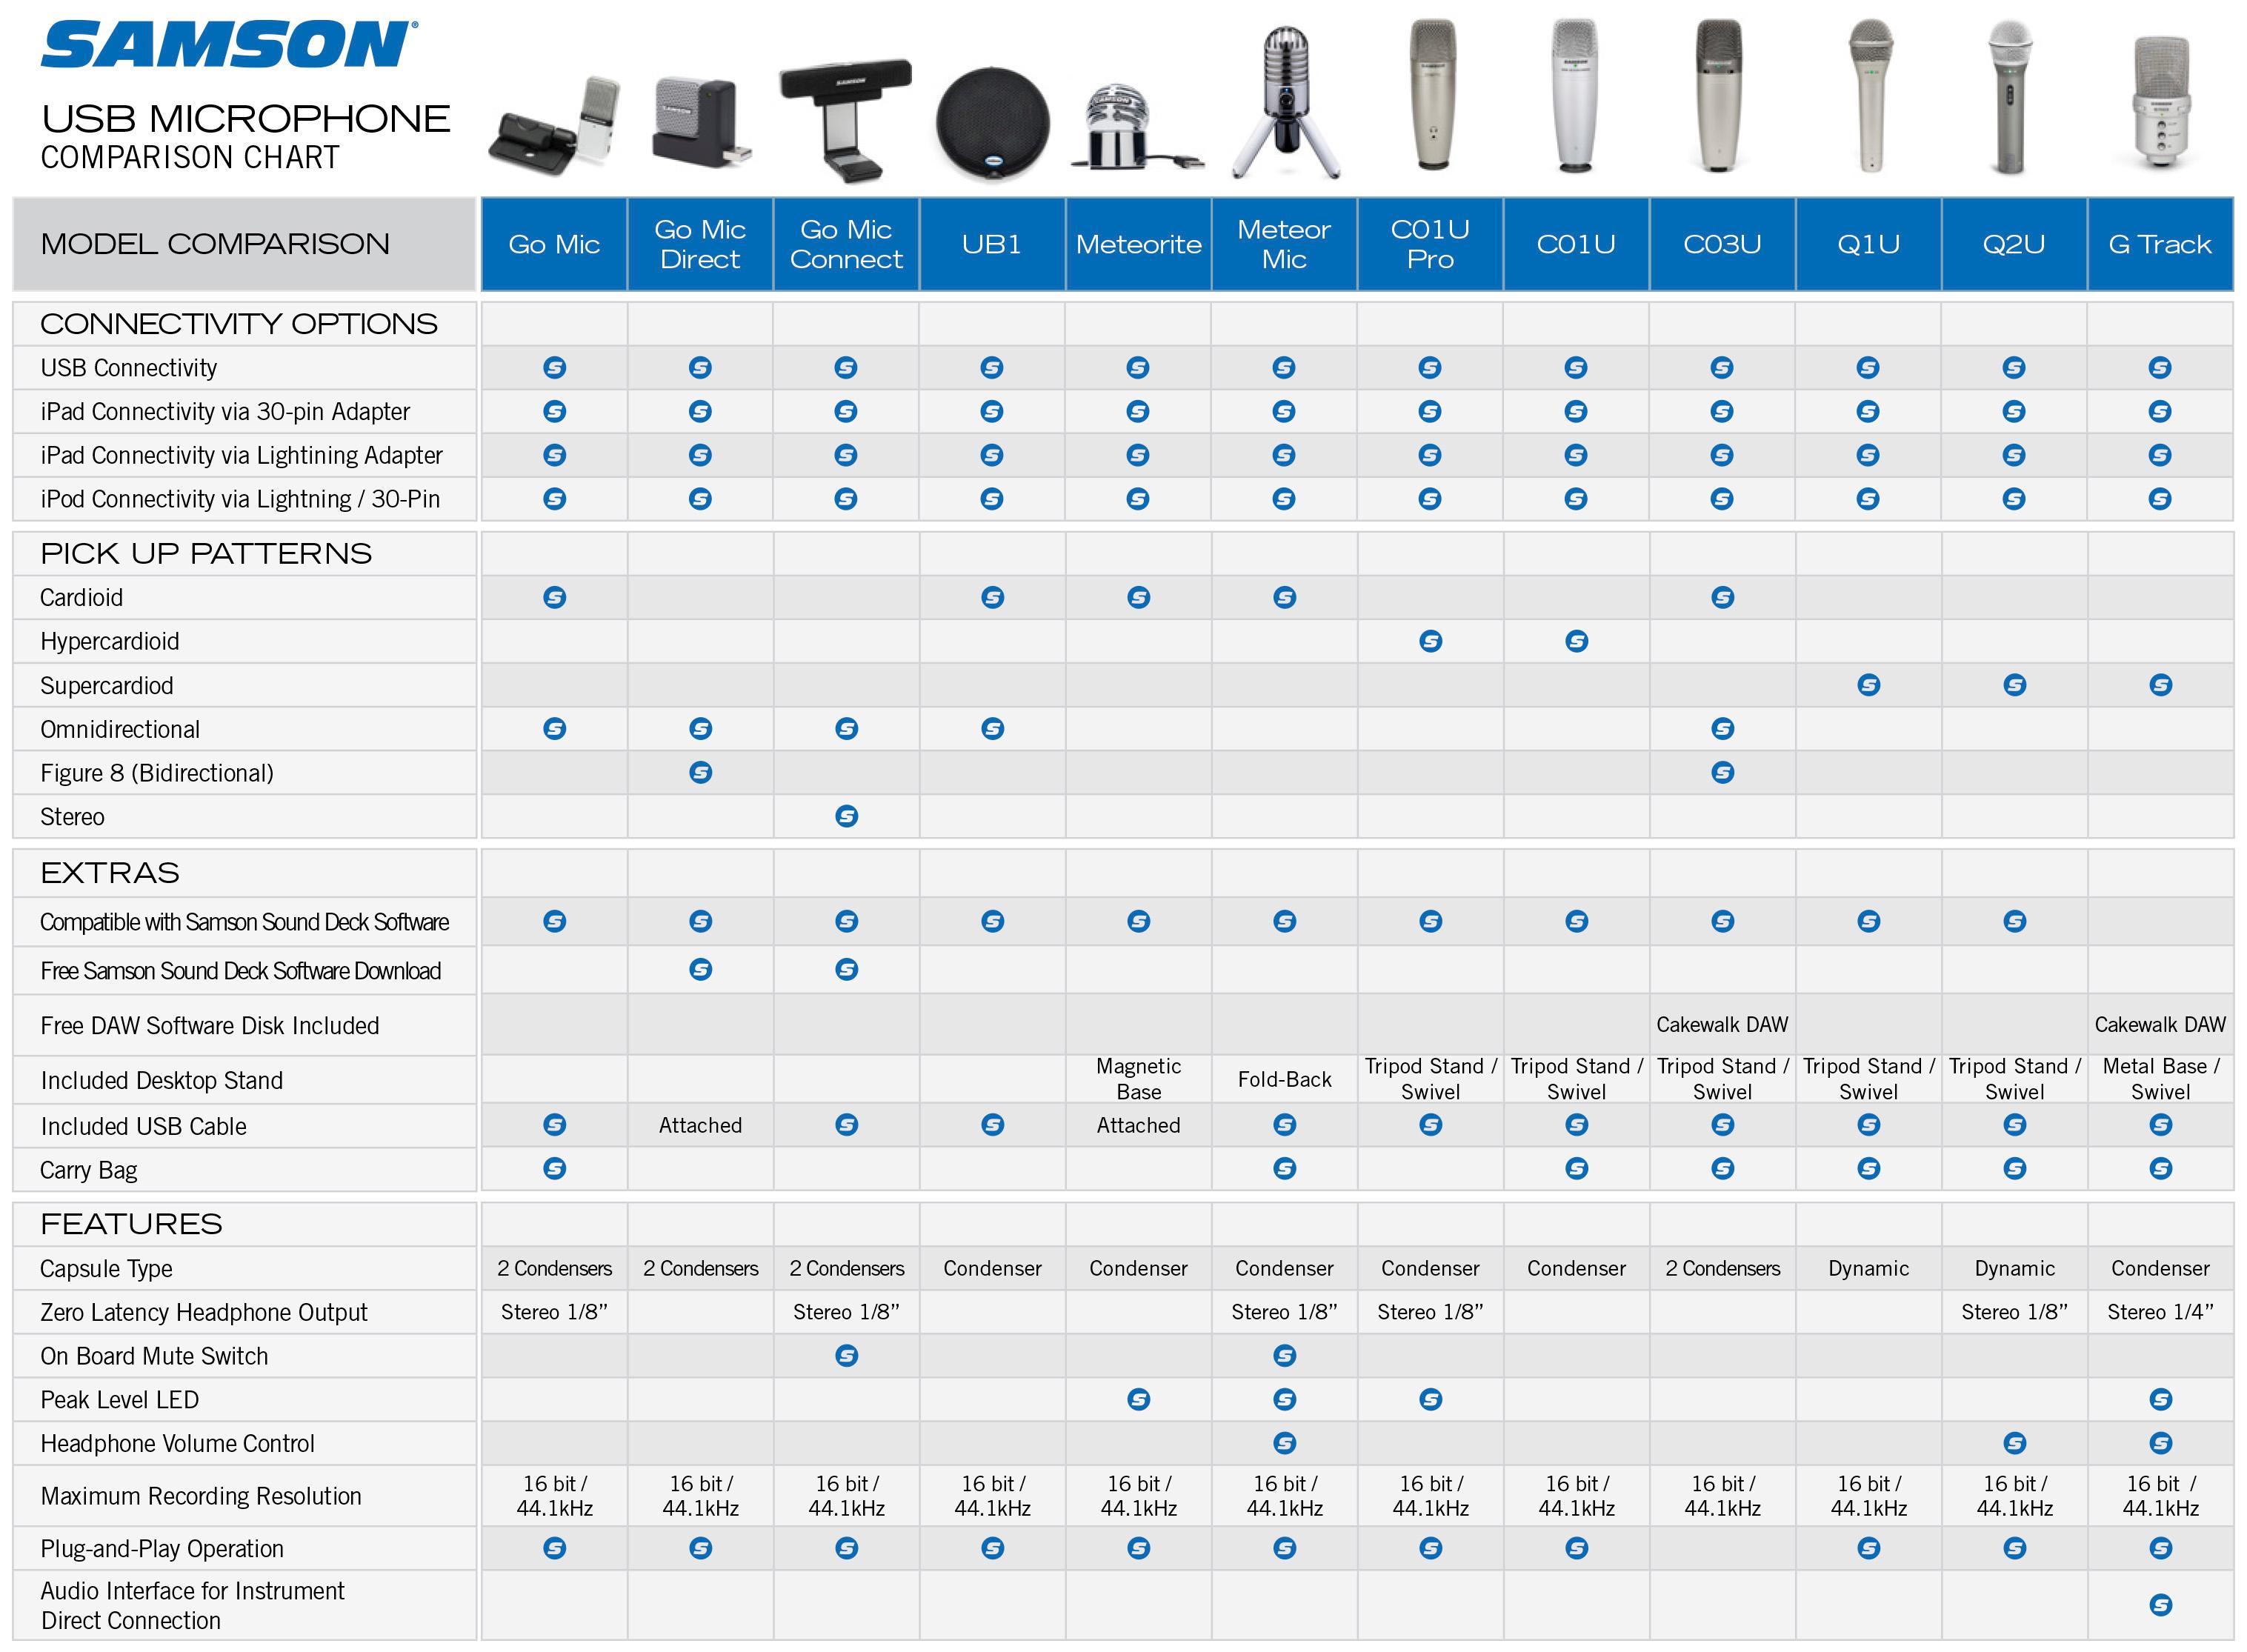 Headphone Jack Sizes Chart Related Keywords Suggestions